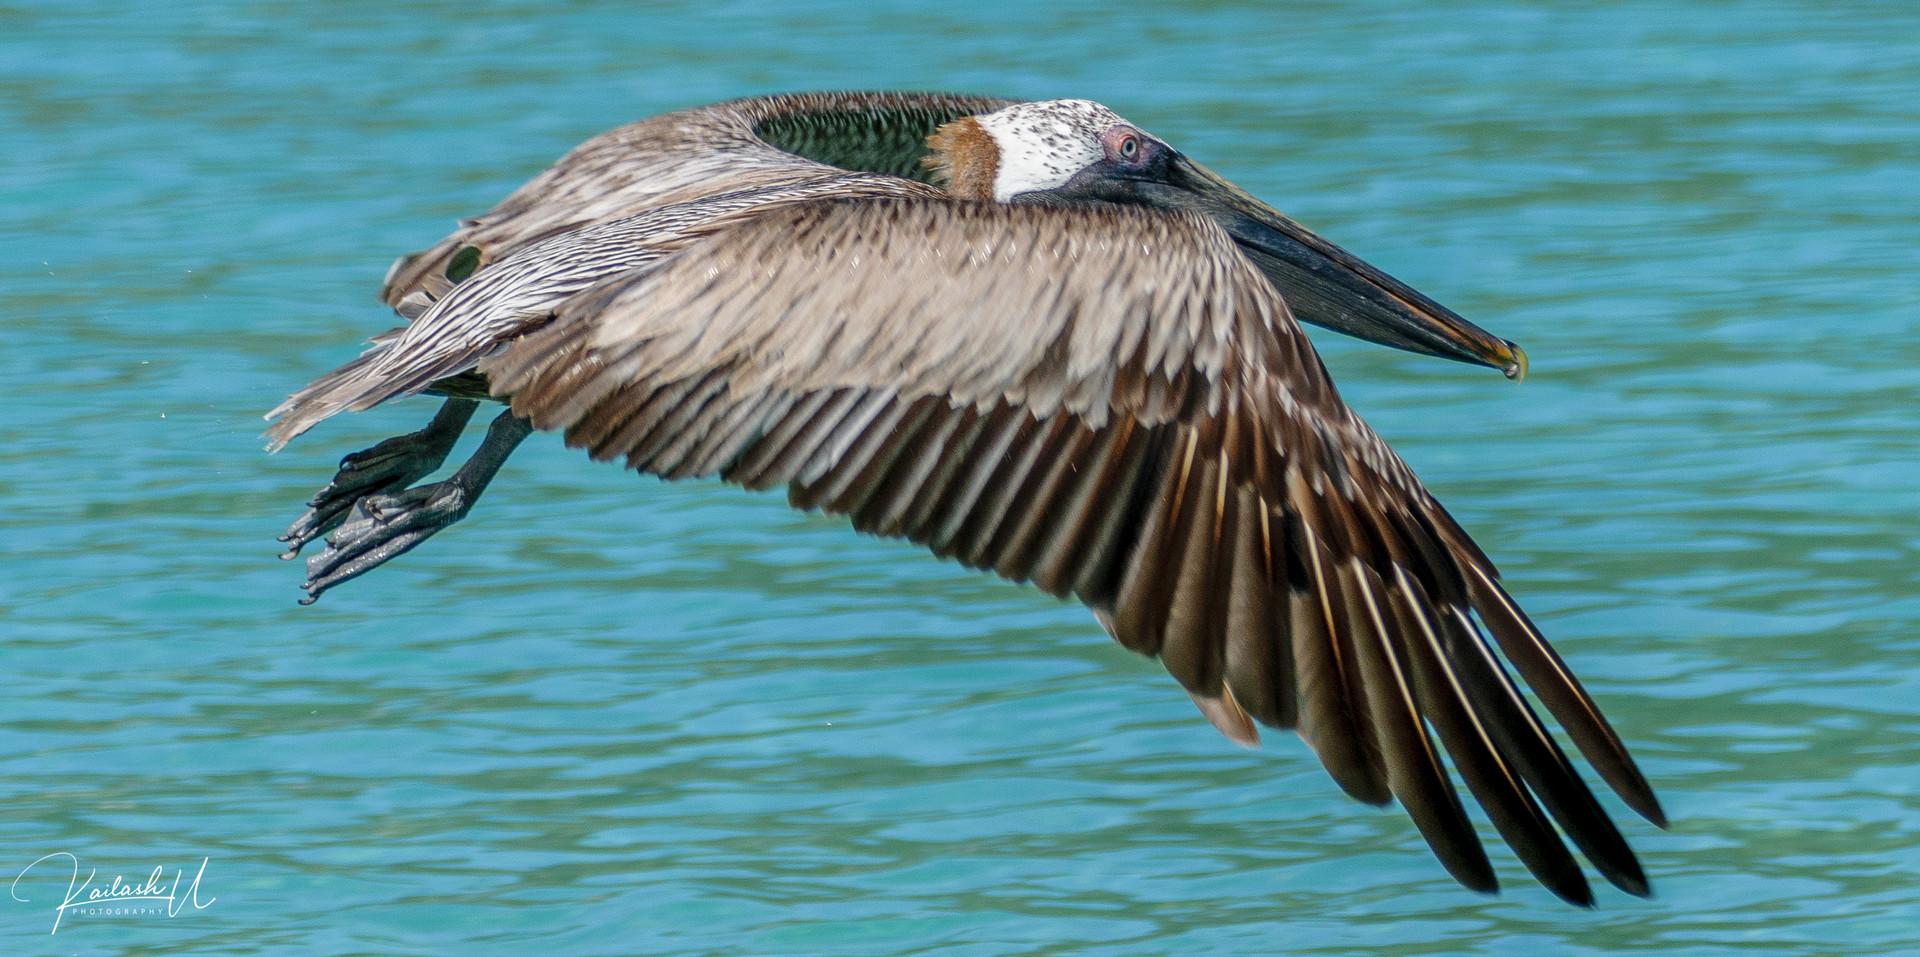 A Pelican going for the kill in Magen's Bay, U.S. Virgin Islands